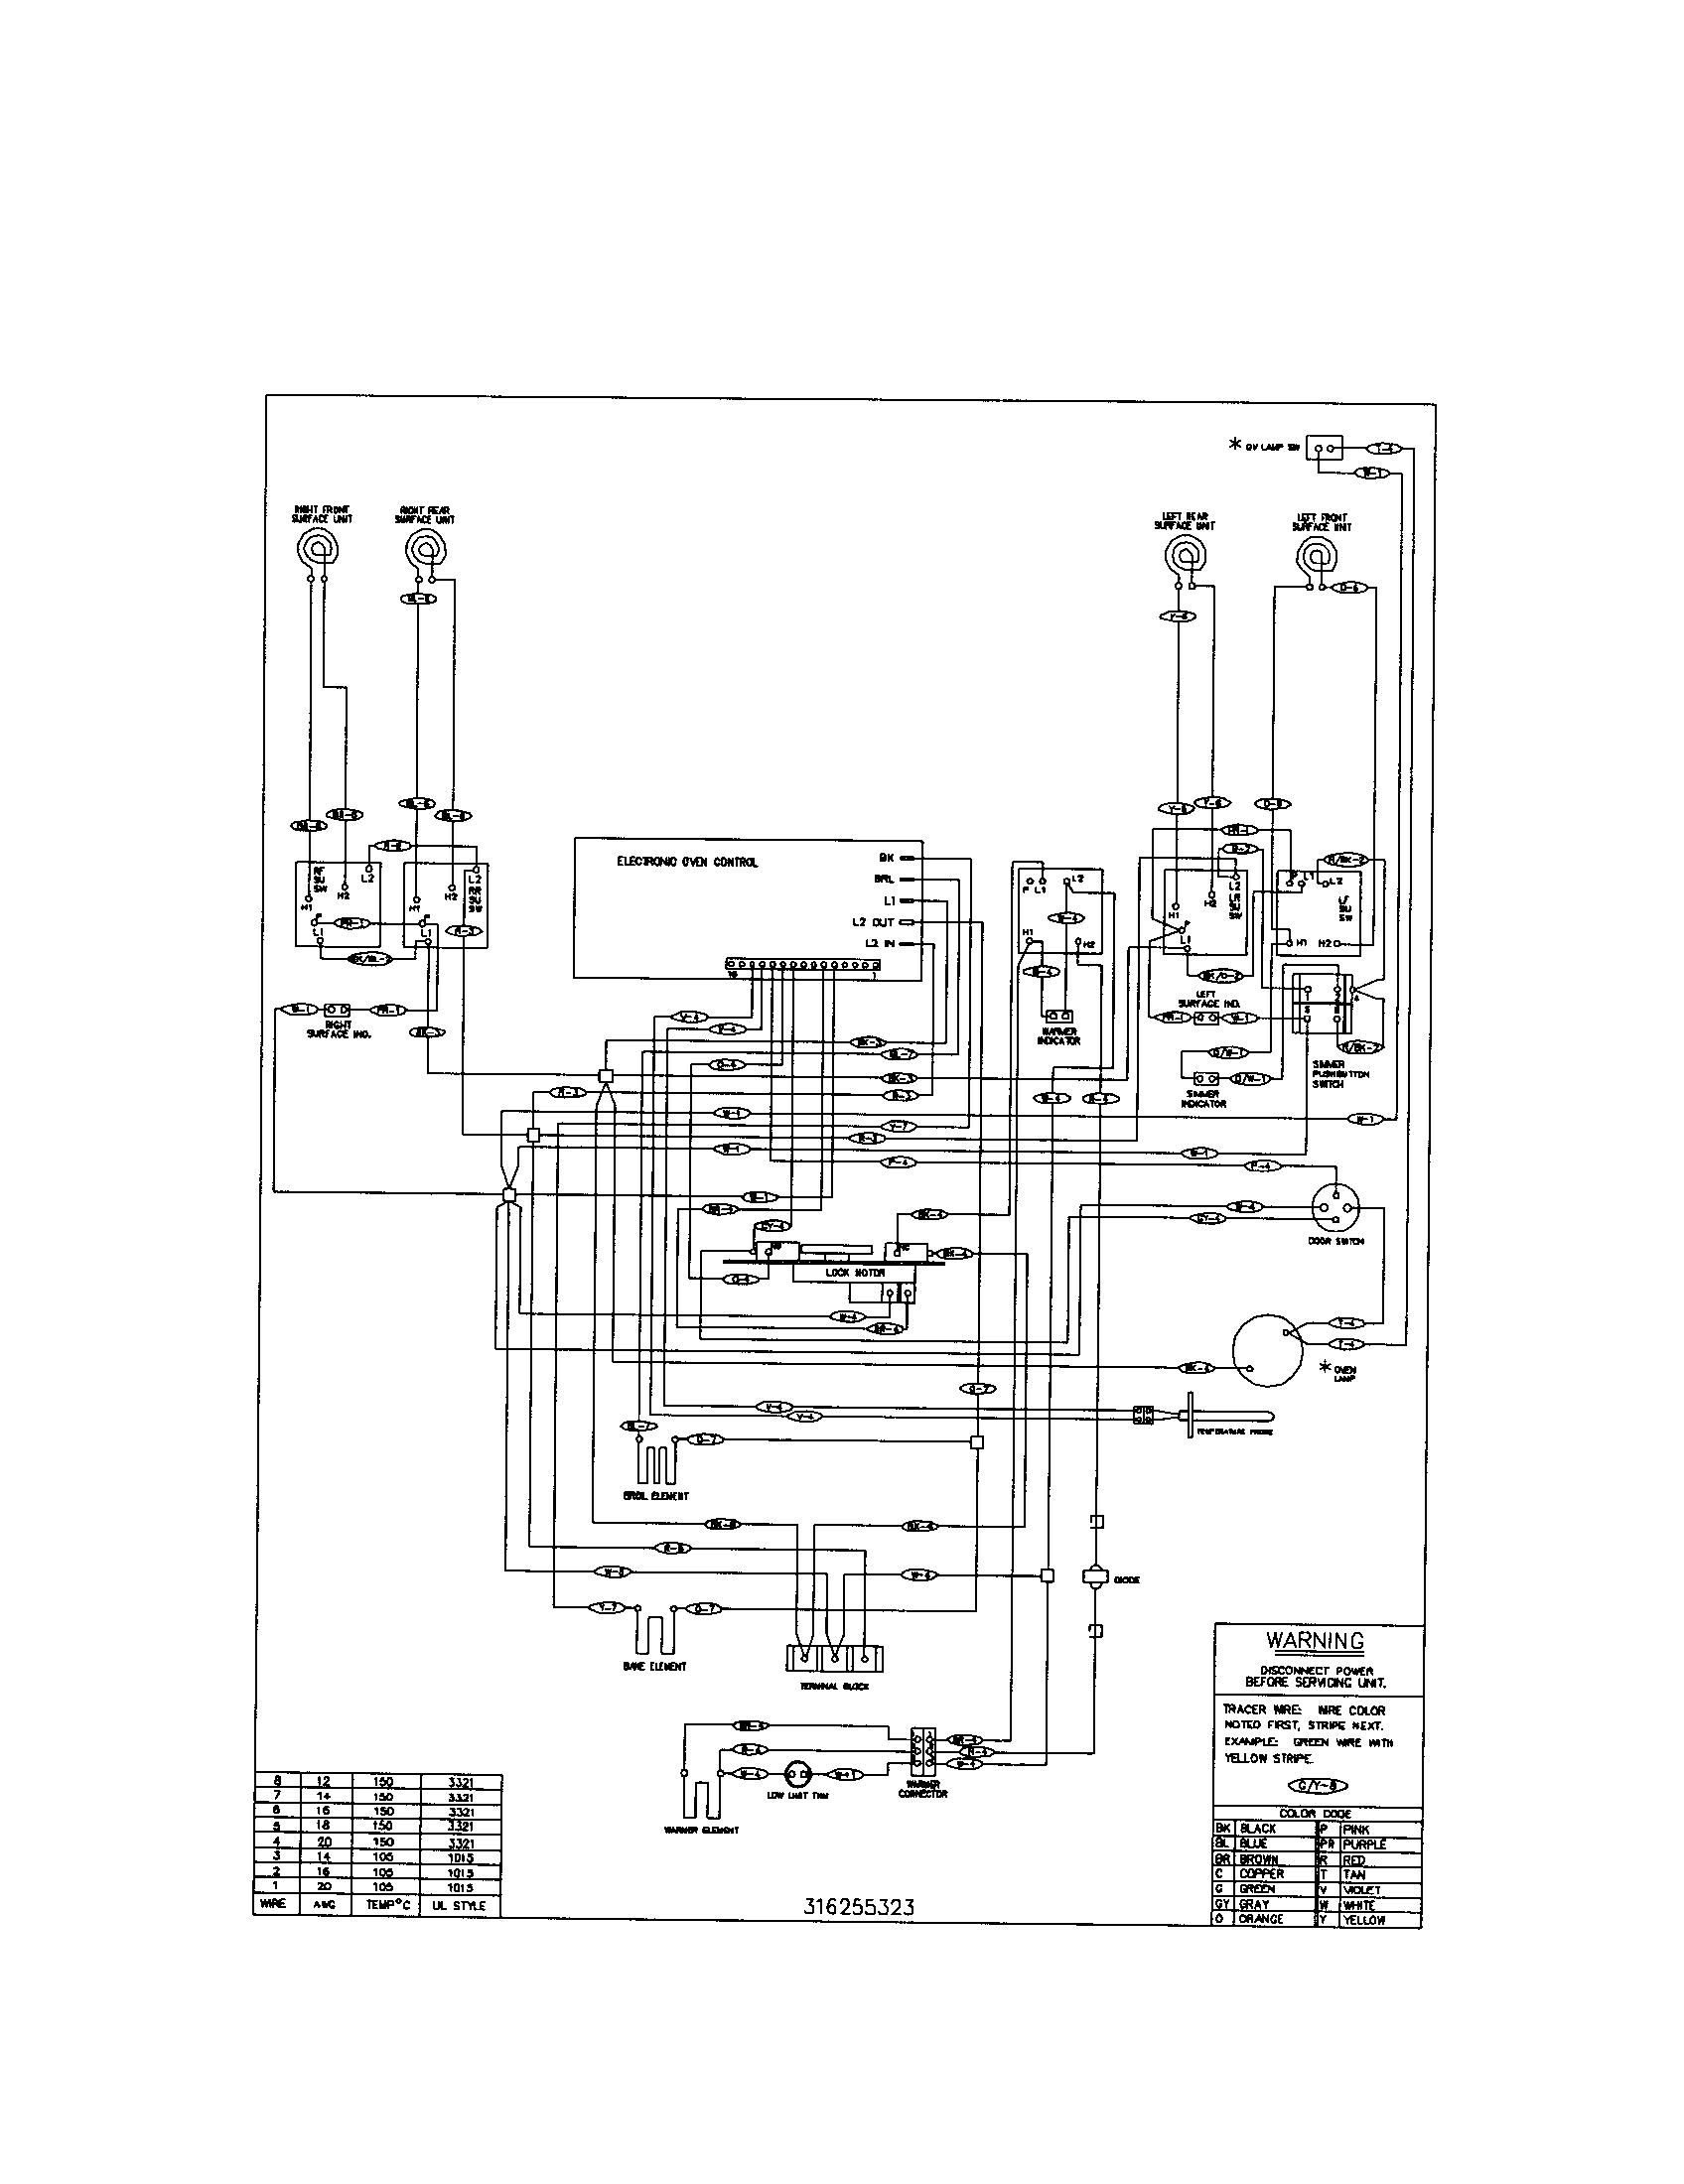 kenmore electric range model 79093859302